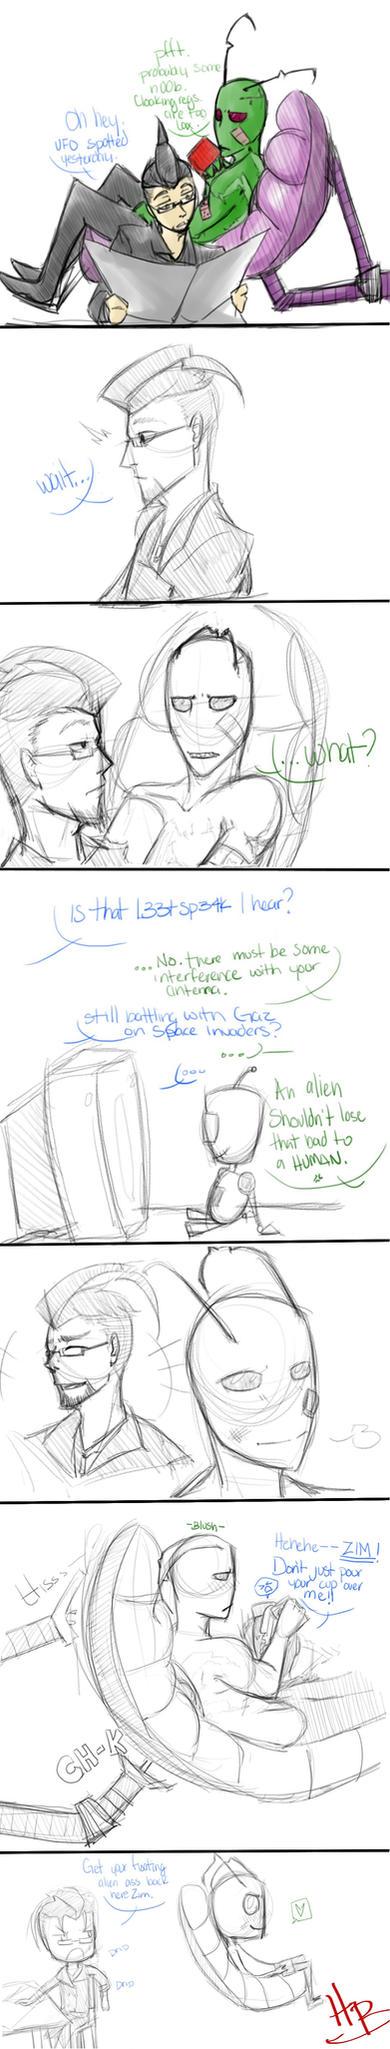 IZ Zim's secret by HakuoBlazer